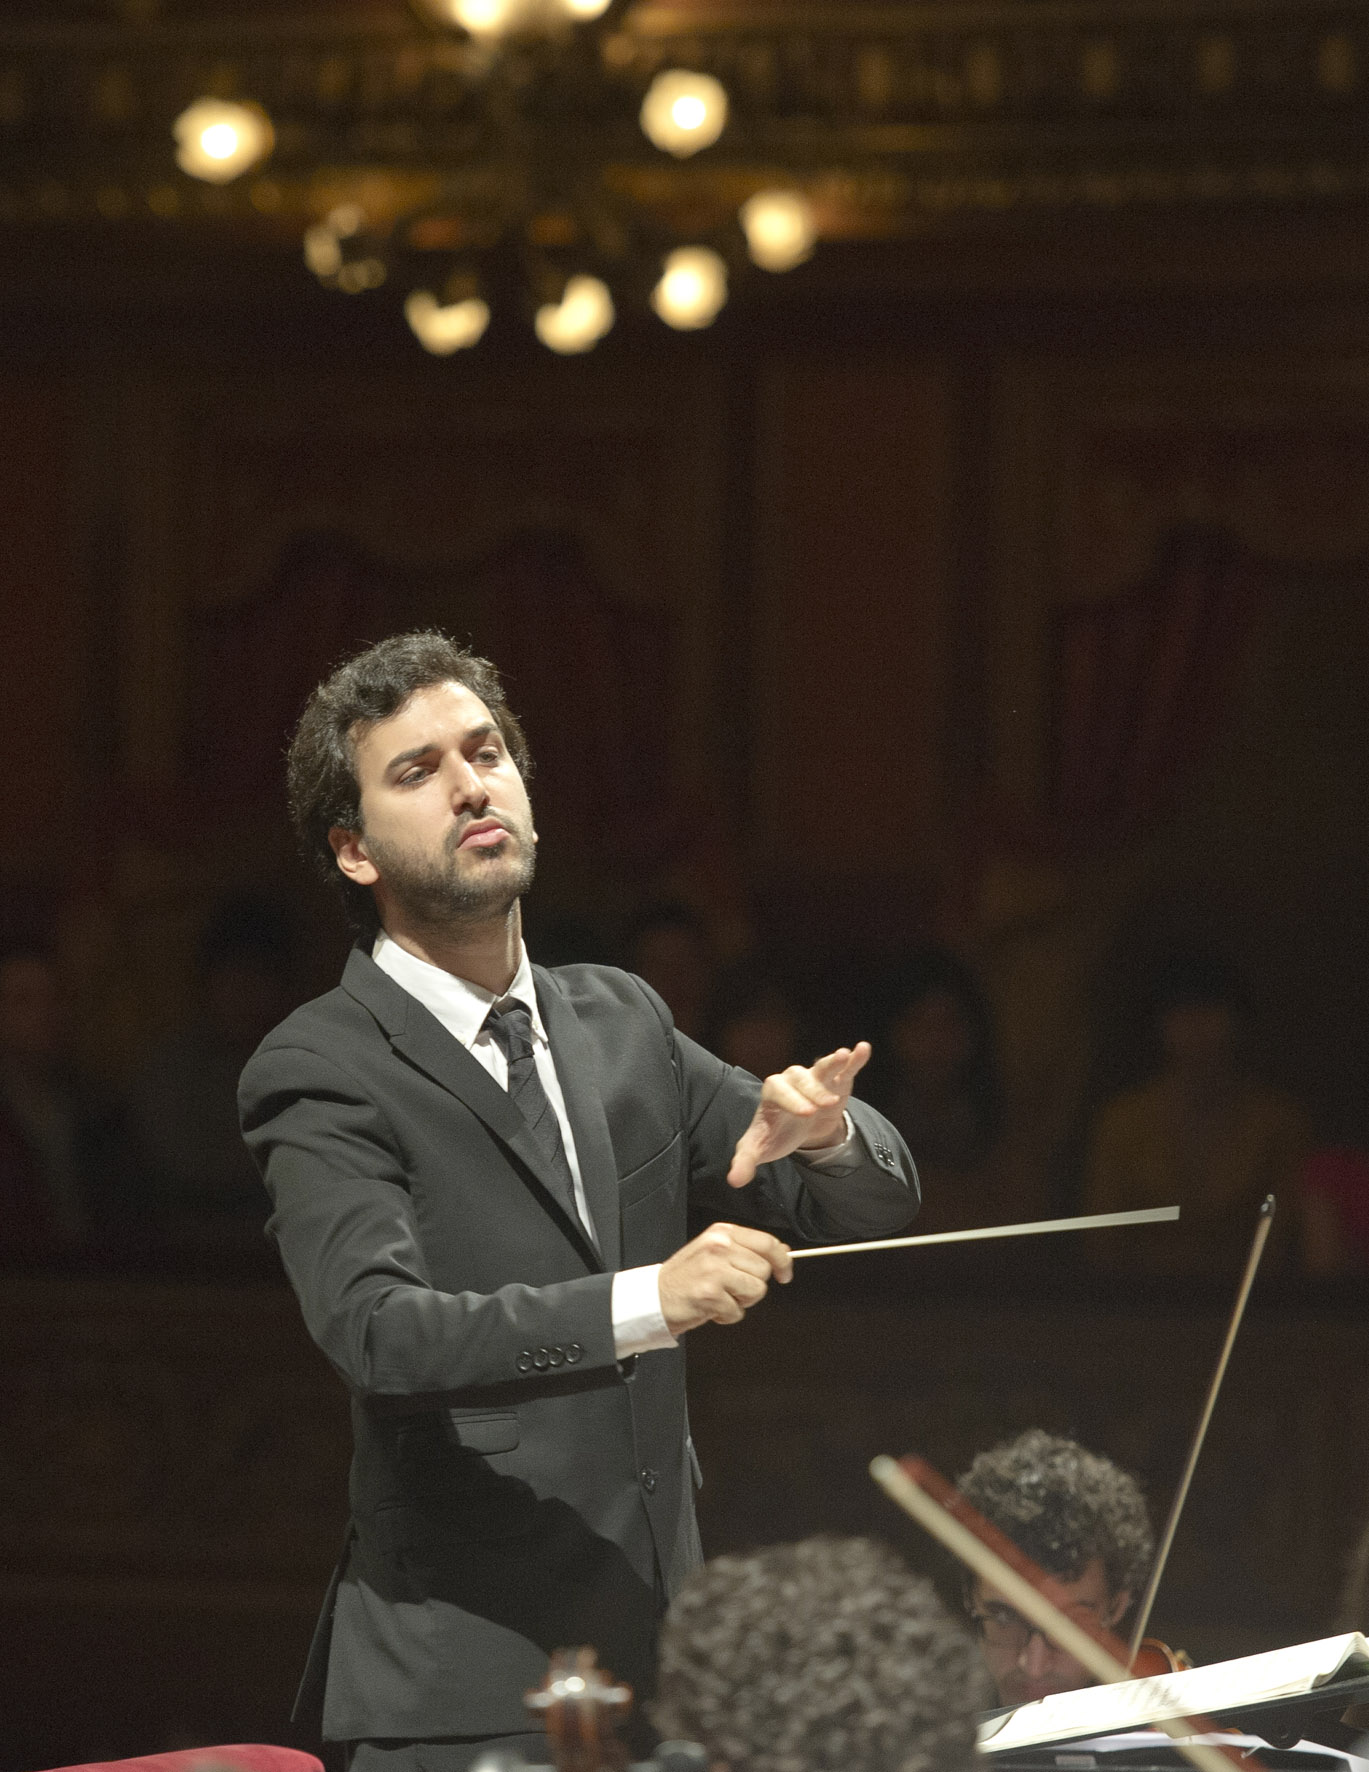 Debut Concert at Teatro Colón